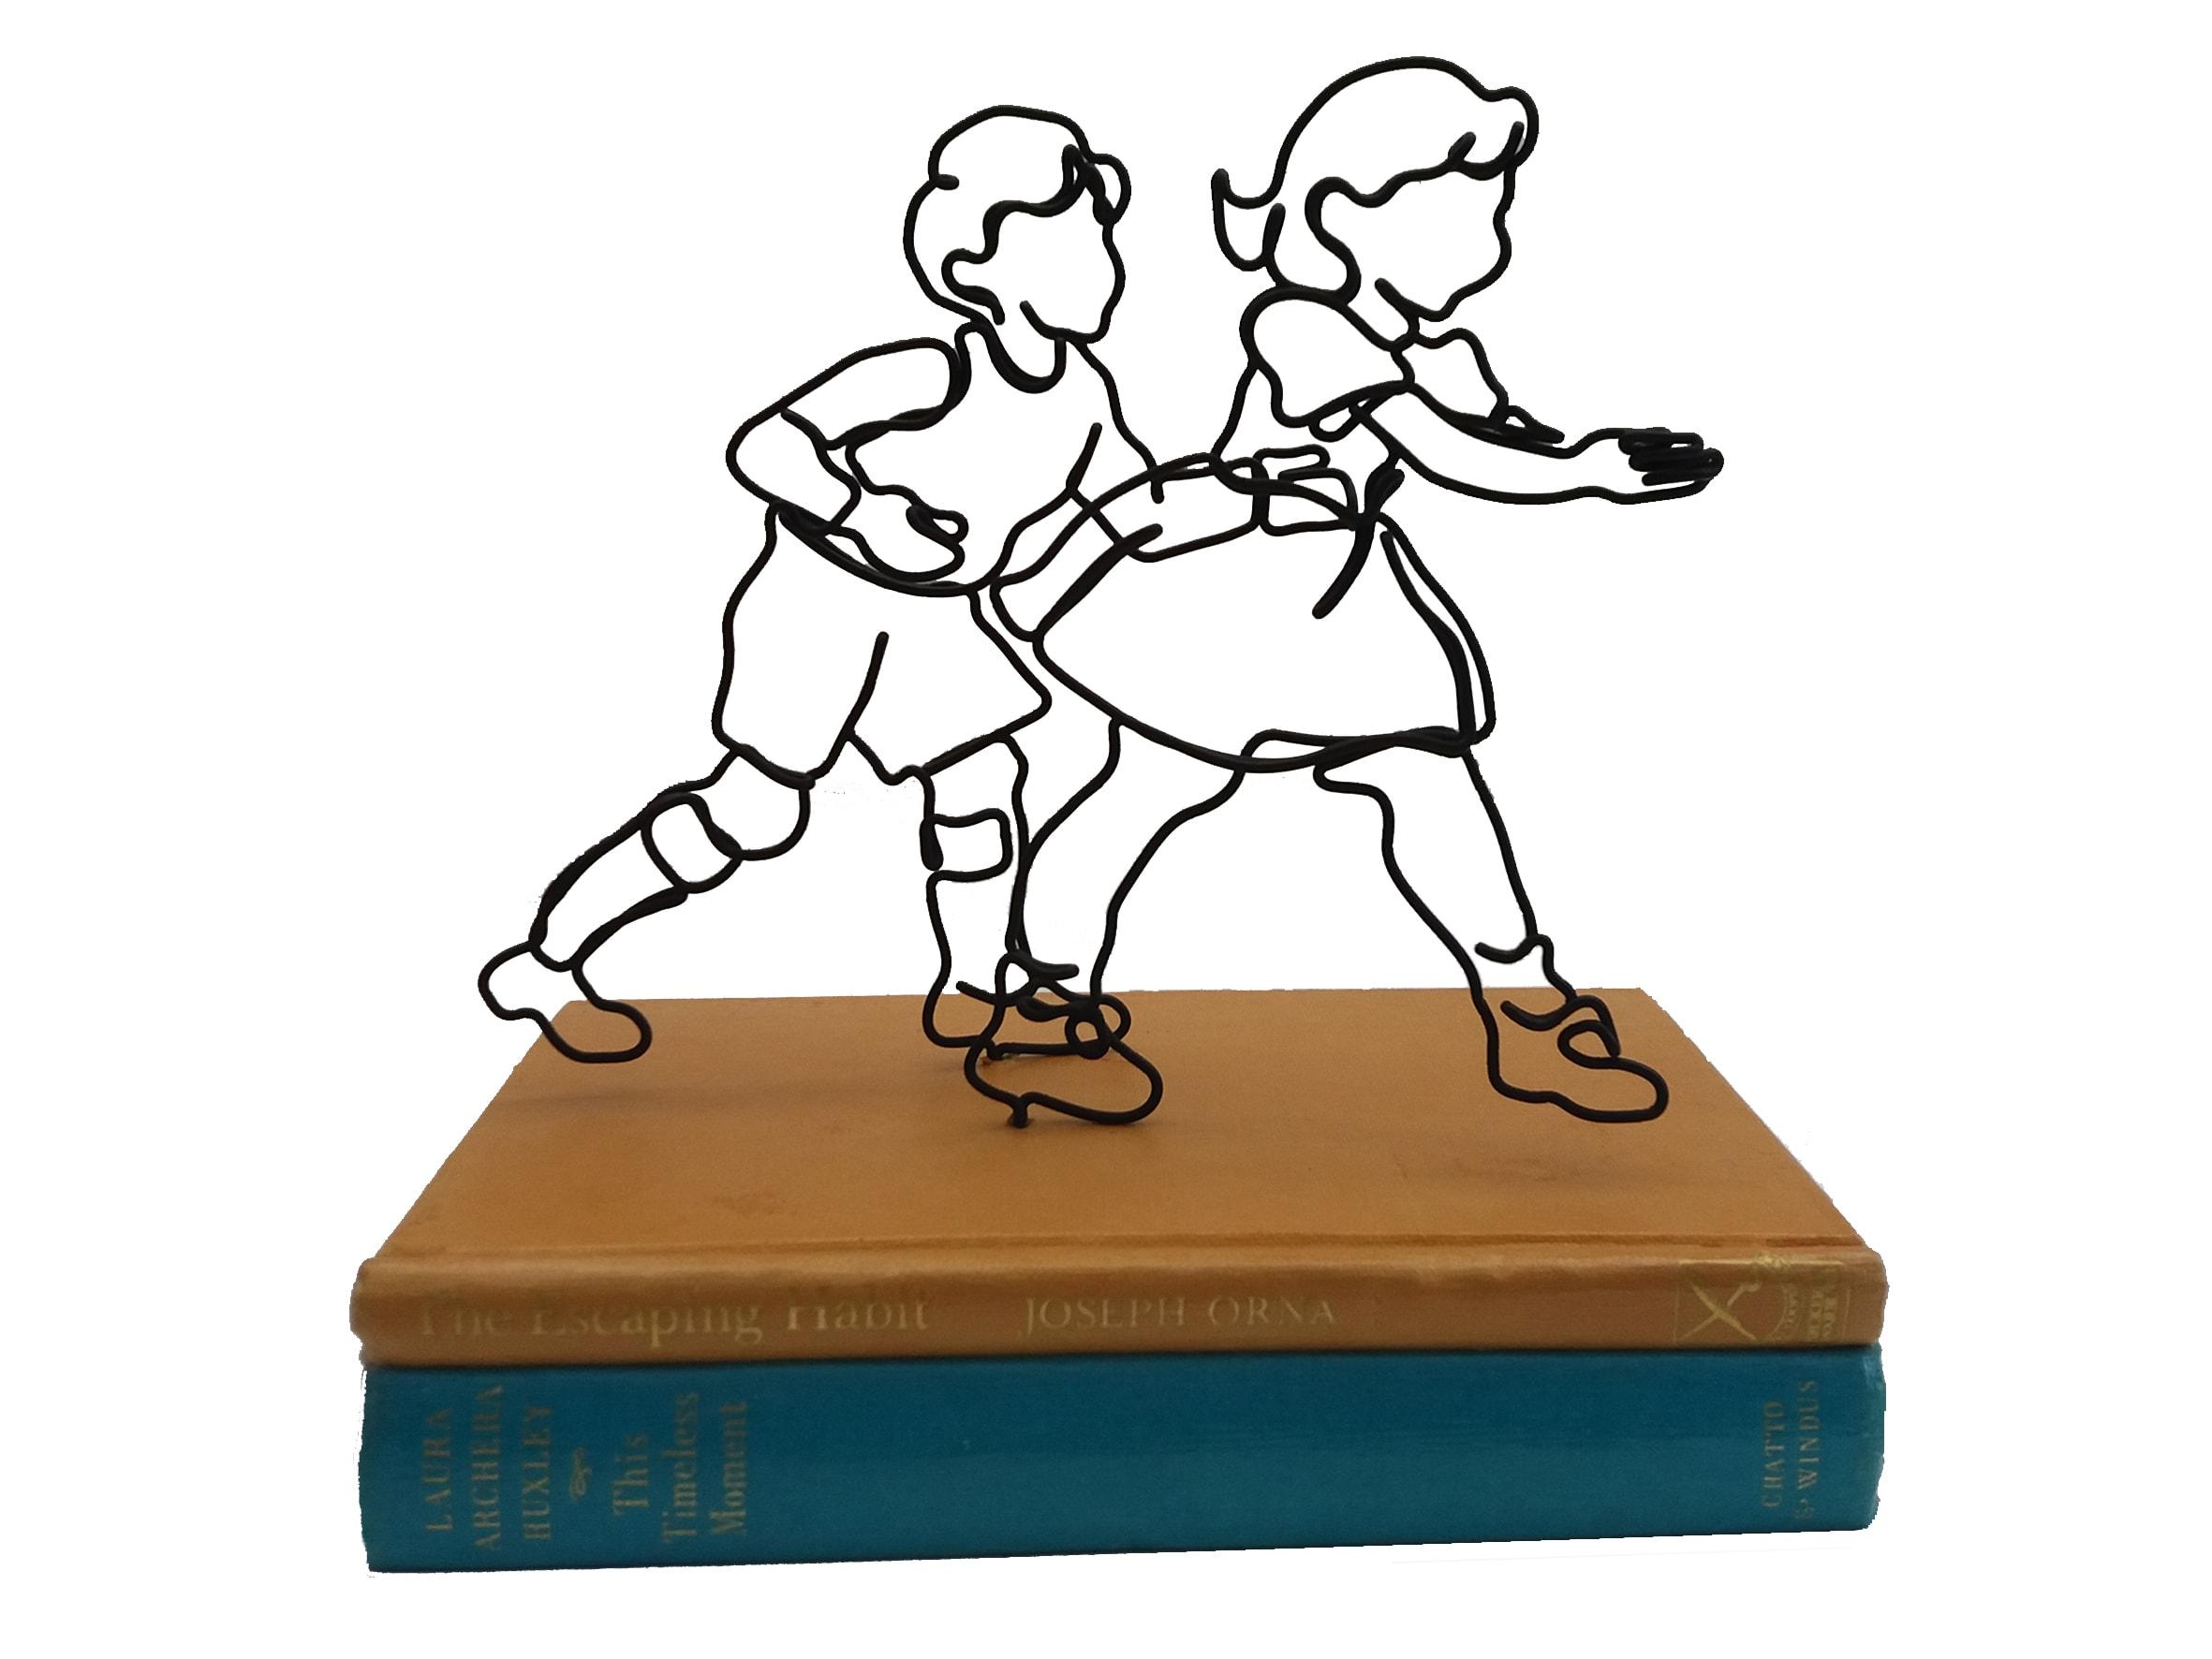 "<span class=""link fancybox-details-link""><a href=""/artists/37-ann-winder-boyle/works/6380-ann-winder-boyle-the-escaping-habit-2019/"">View Detail Page</a></span><div class=""artist""><strong>Ann Winder-Boyle</strong></div> b. 1963 <div class=""title""><em>The Escaping Habit</em>, 2019</div> <div class=""medium"">Vintage Books and Wire</div><div class=""price"">£325.00</div><div class=""copyright_line"">Own Art £32.50 x 10 months, 0% APR</div>"